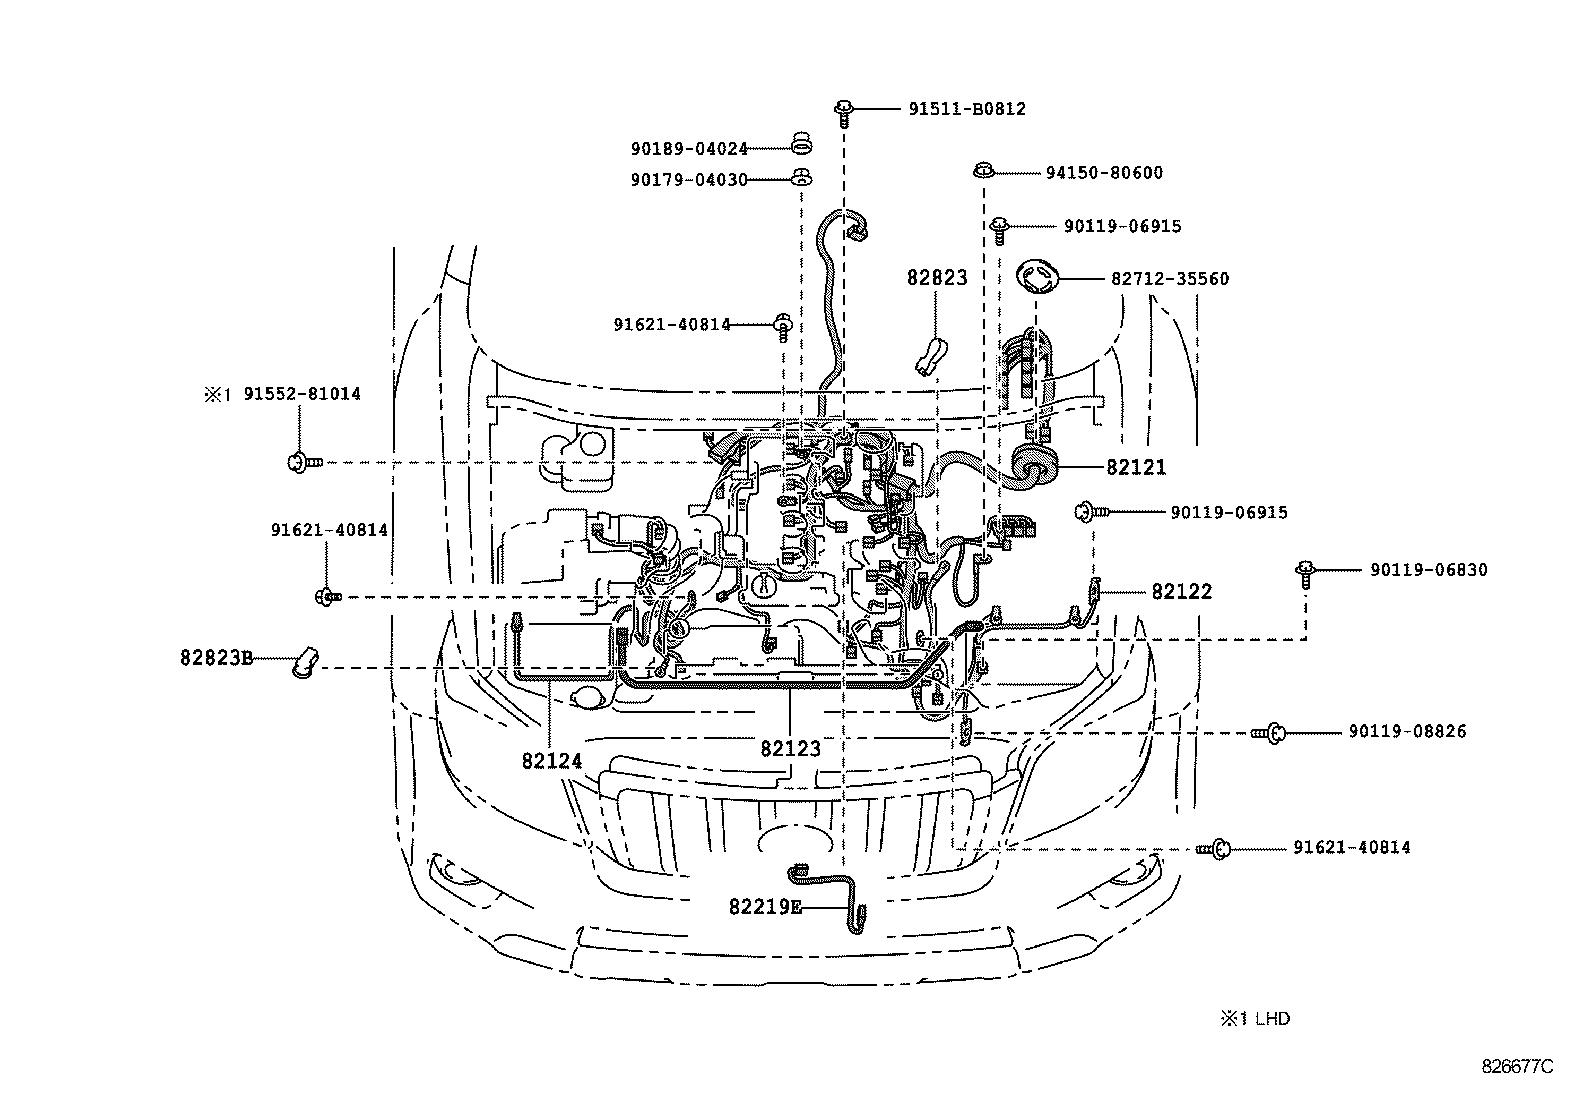 Toyota Land Cruiser Pradokdj150l-gkaey